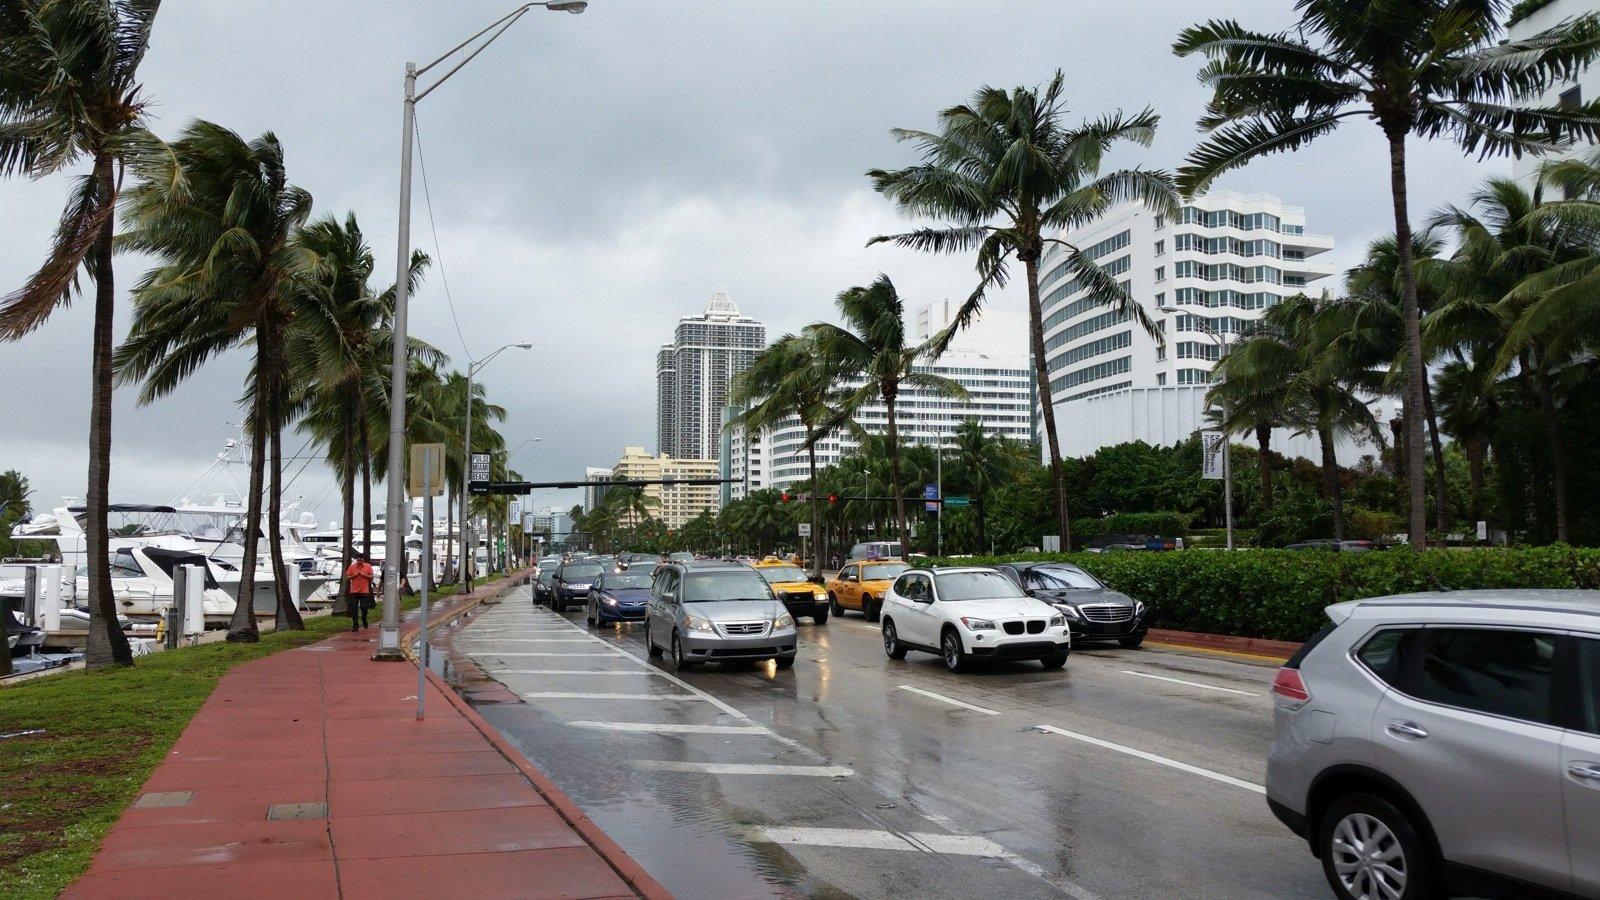 Miamis, The</name></artist><artist><name>Lou Deprijck* Lou - Vamos A La Playa